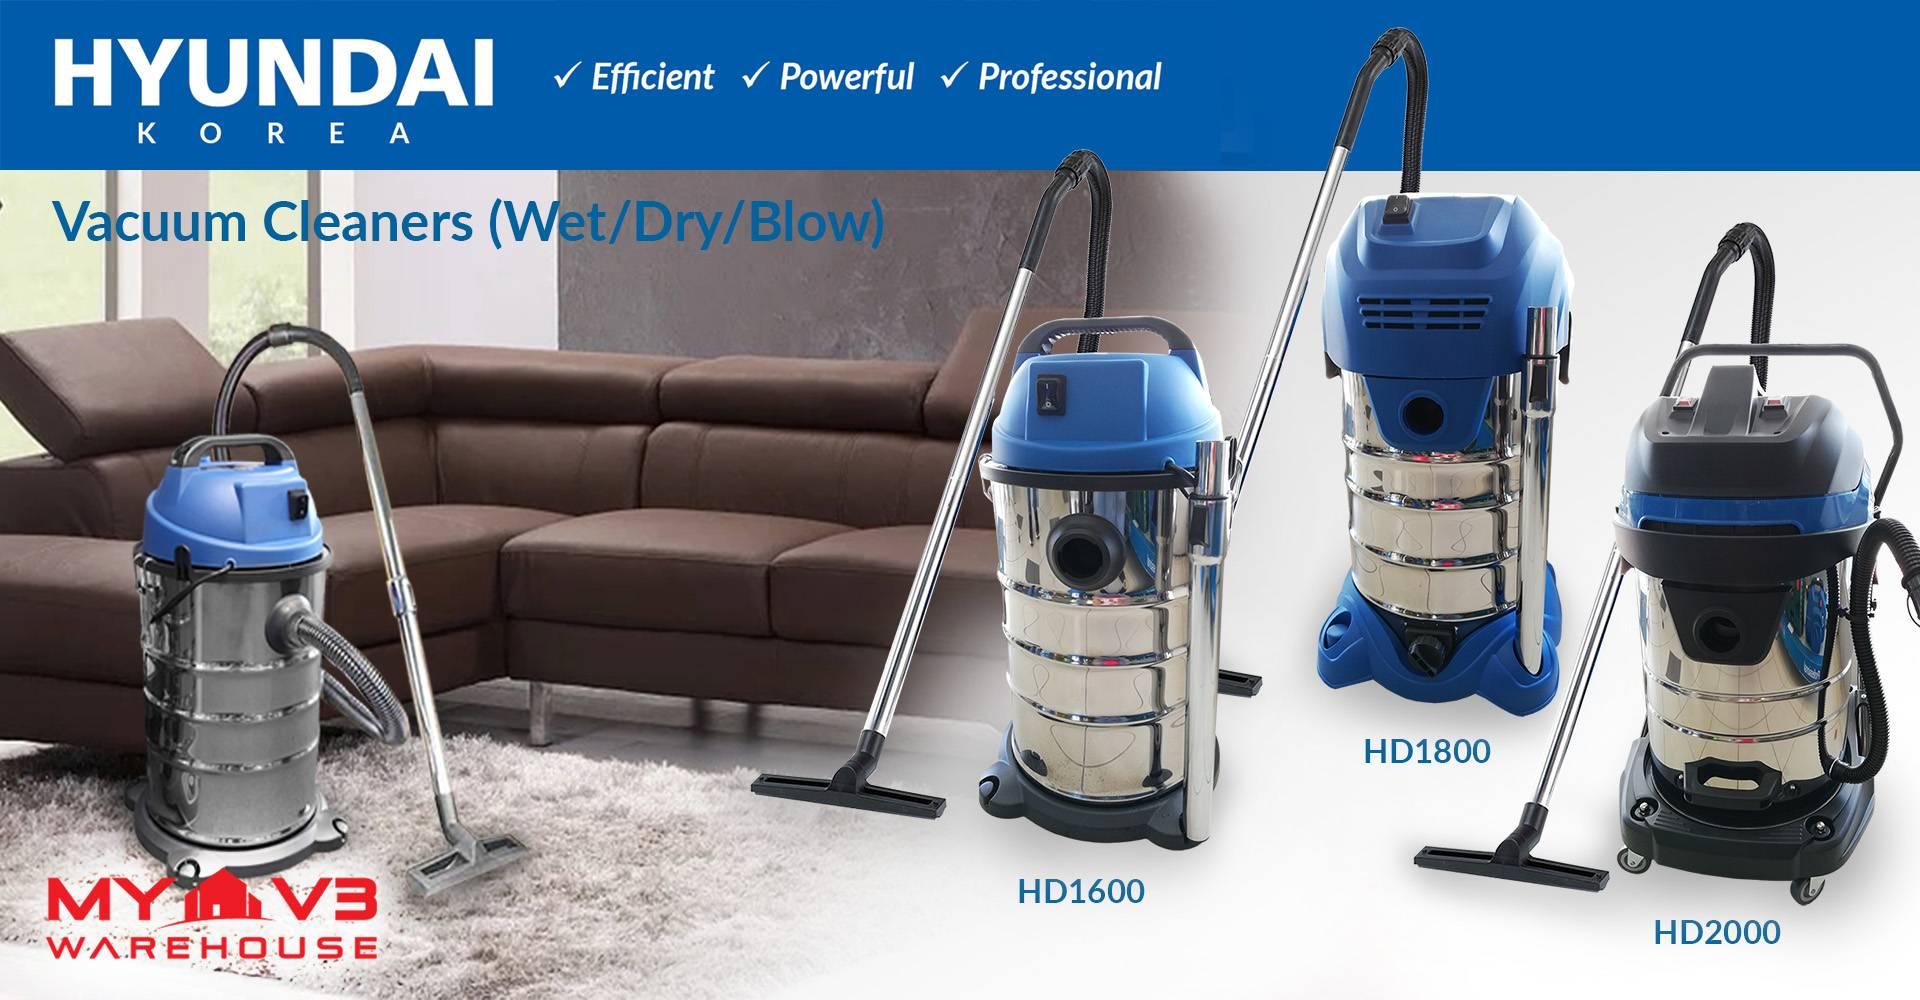 HYUNDAI Vacuum Cleaners